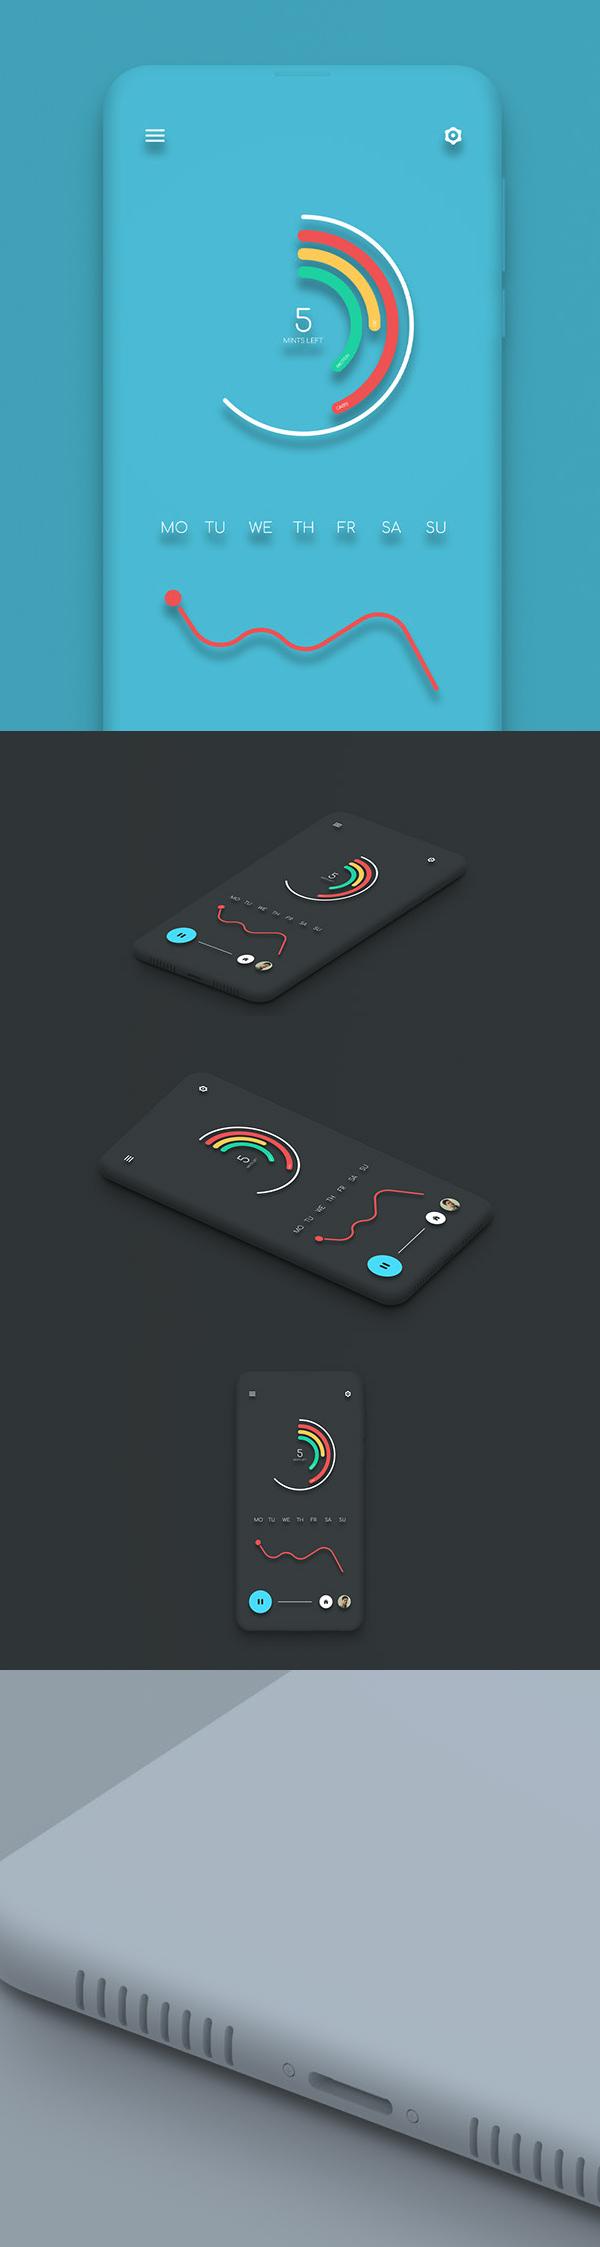 Free Minimalist Smartphone Mockup